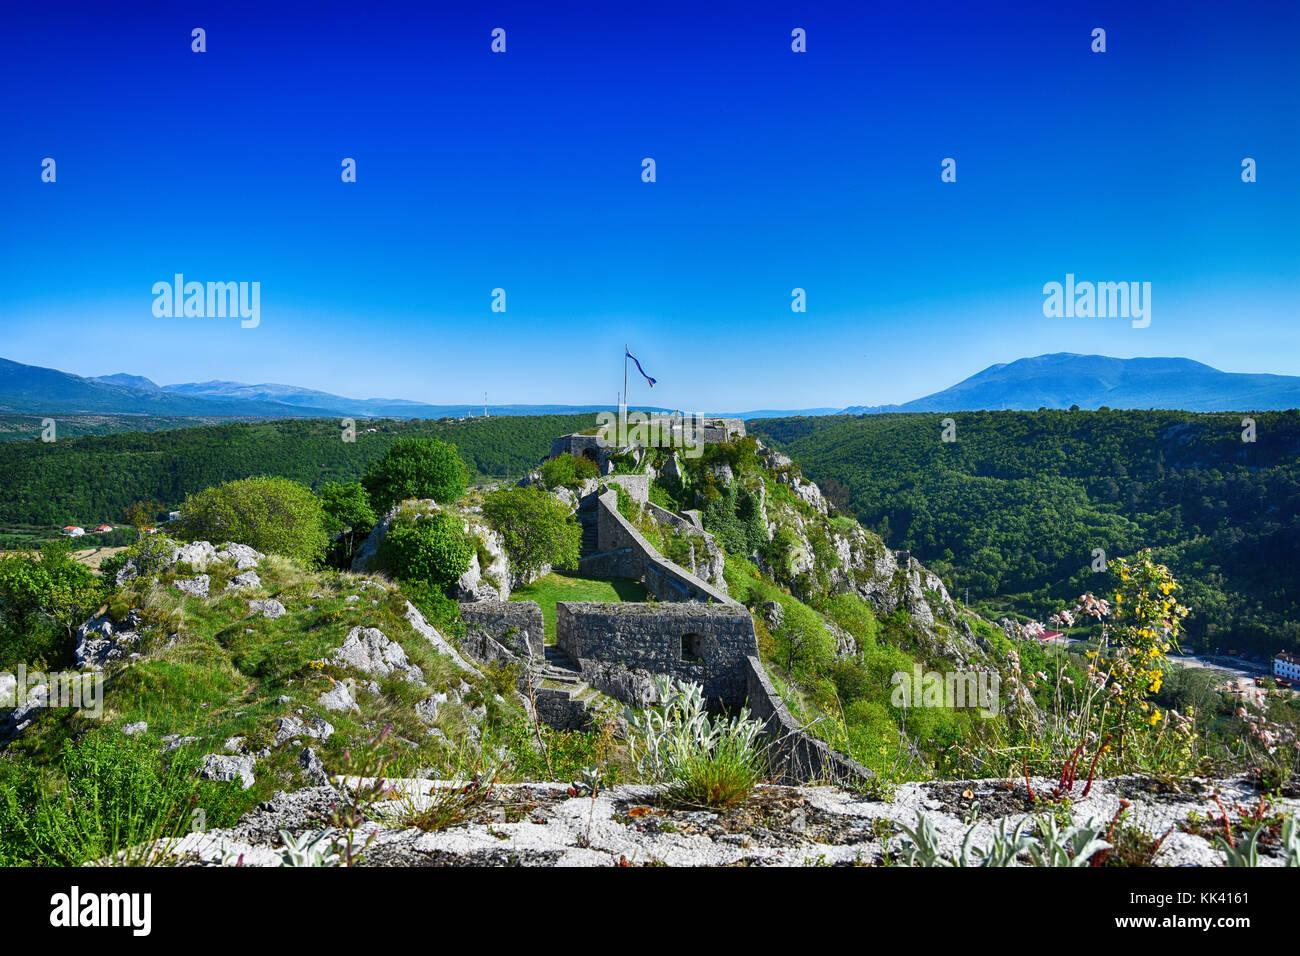 Details der Festung Knin, Knin, Kroatien Stockbild